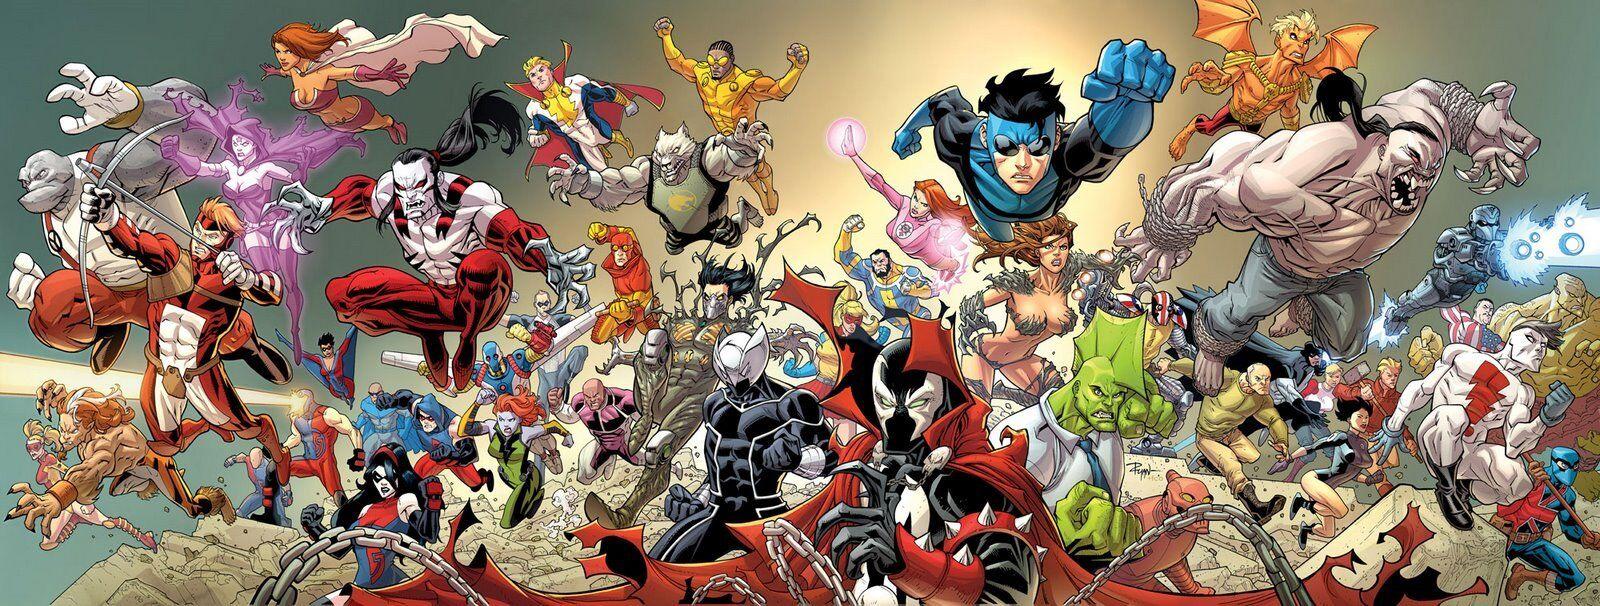 Paladinsgate Comics